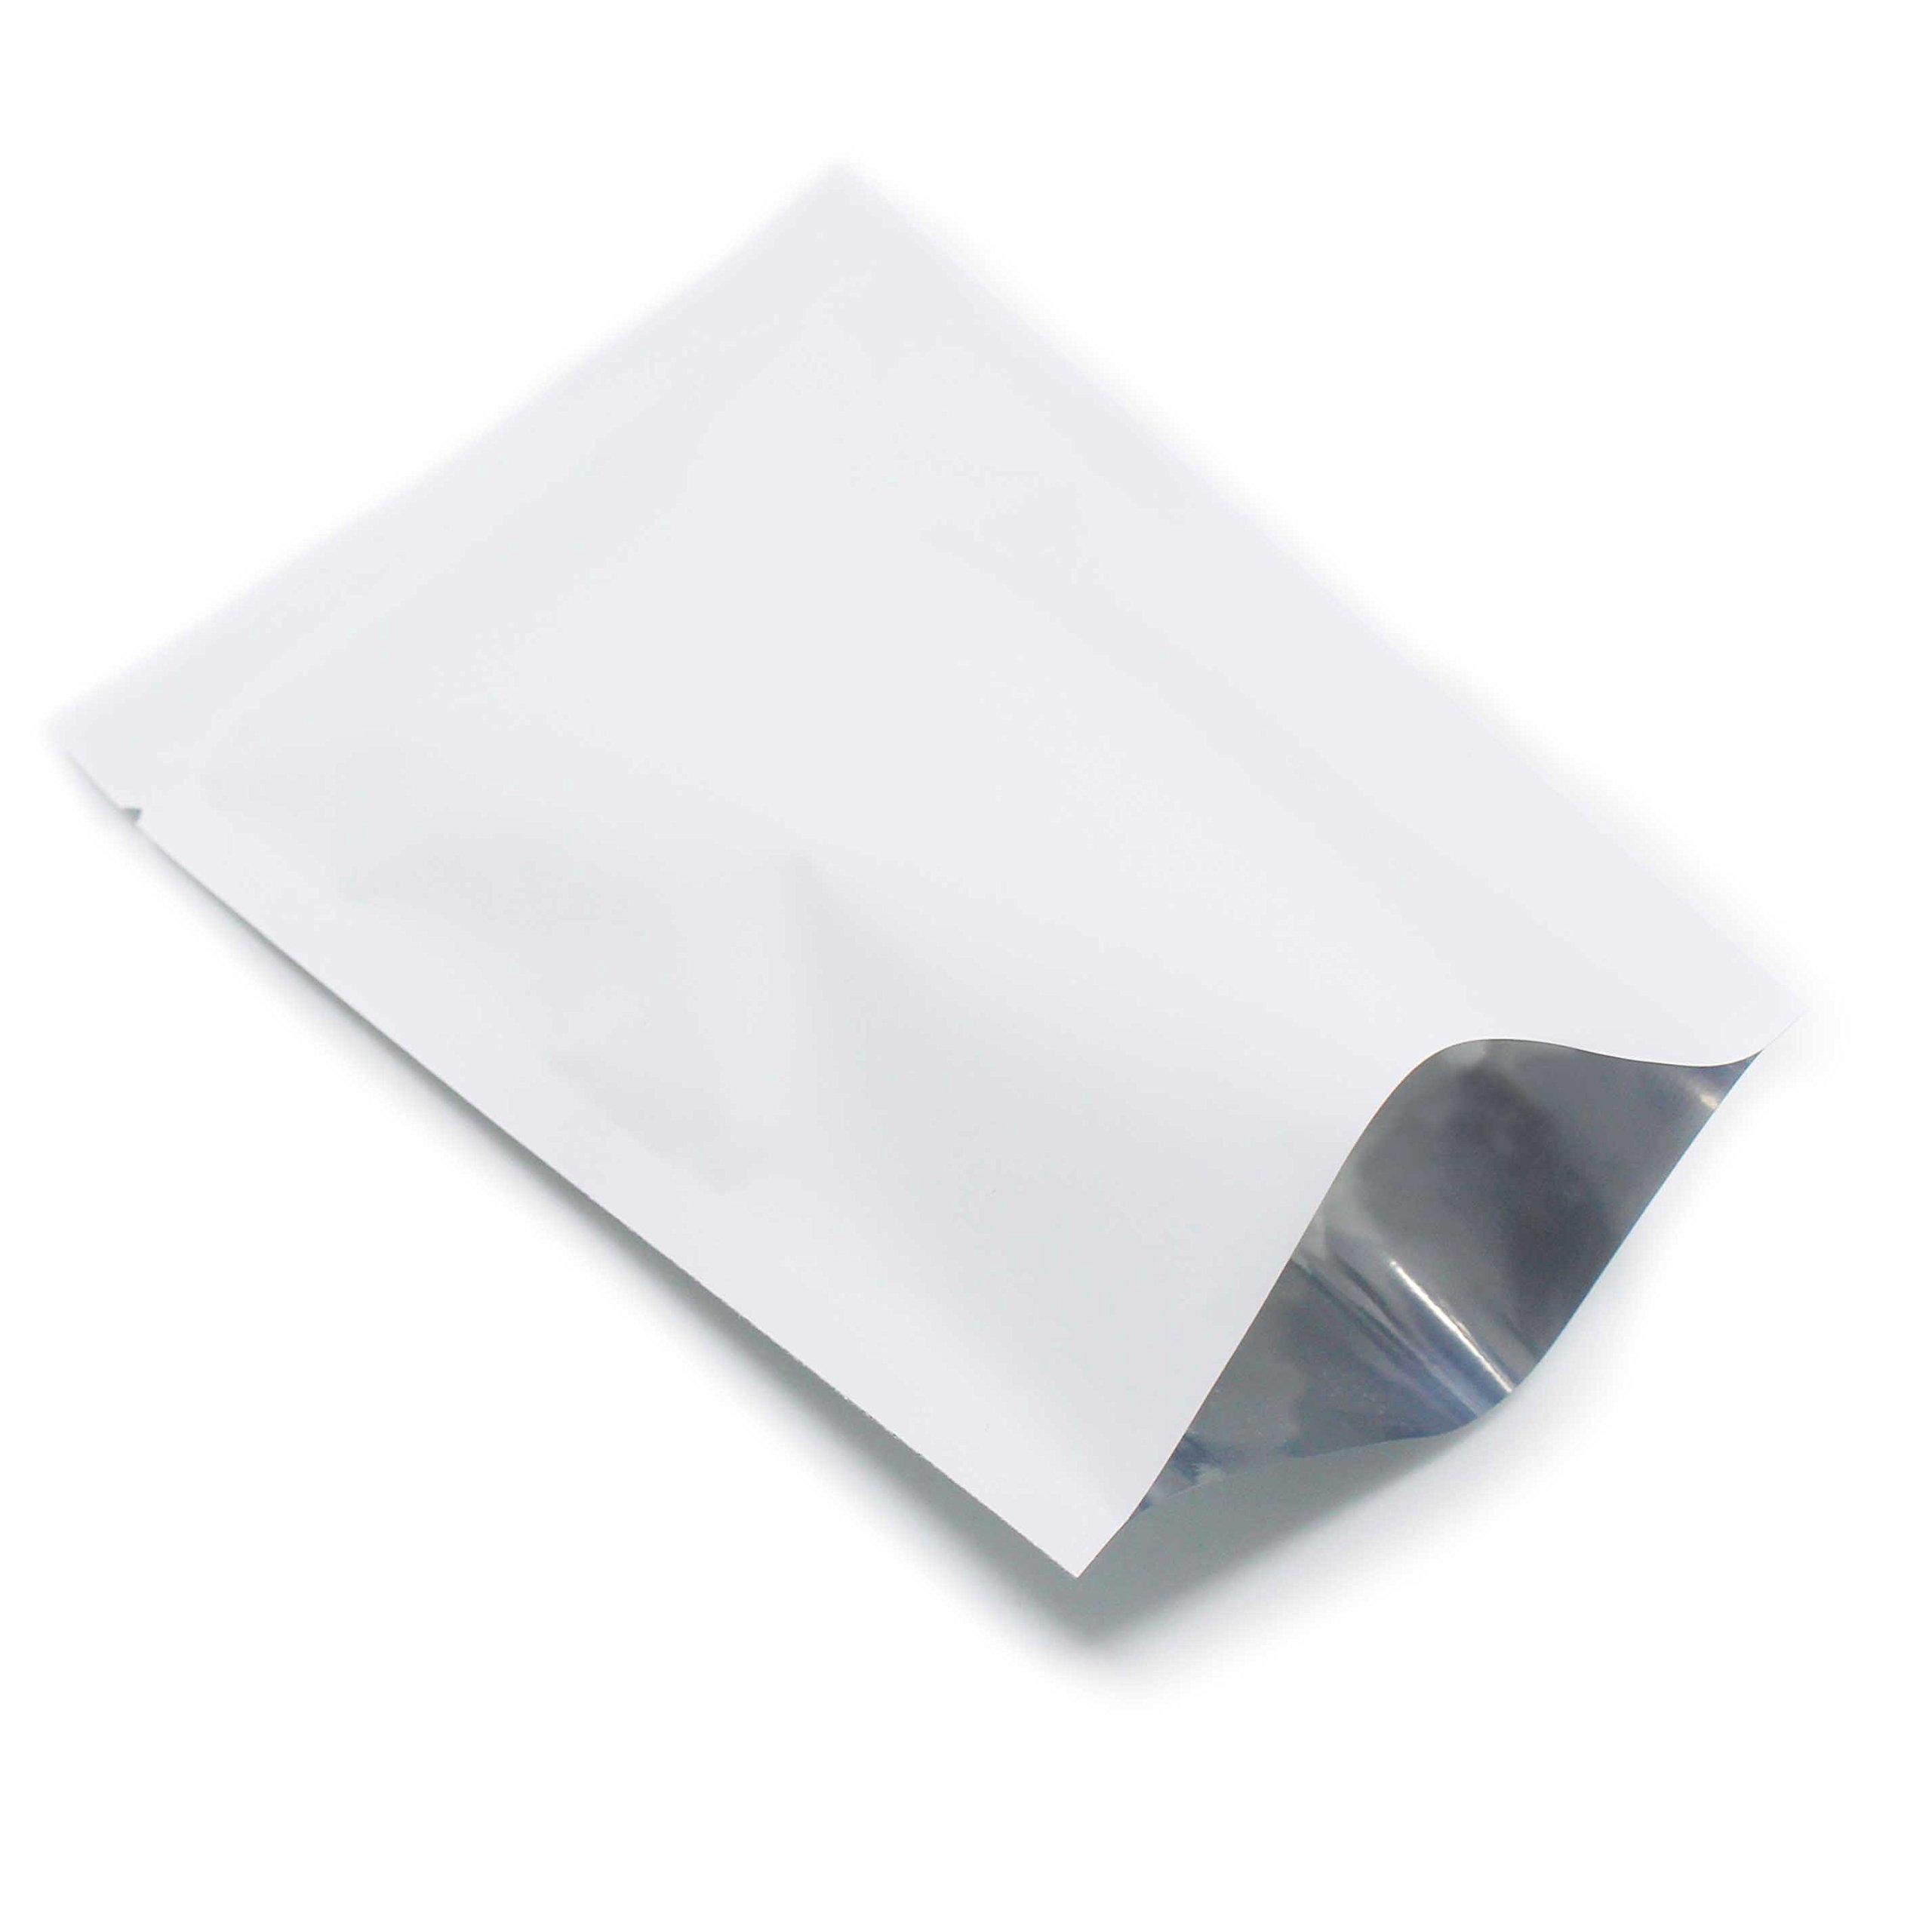 6x9cm (2.3''x3.5'') Matte Alufoil Green White Food Storage Packaging Pouches Mylar Scrub Aluminum Foil Open Top Matte Vacuum Bag Heat Seal (2800, White)